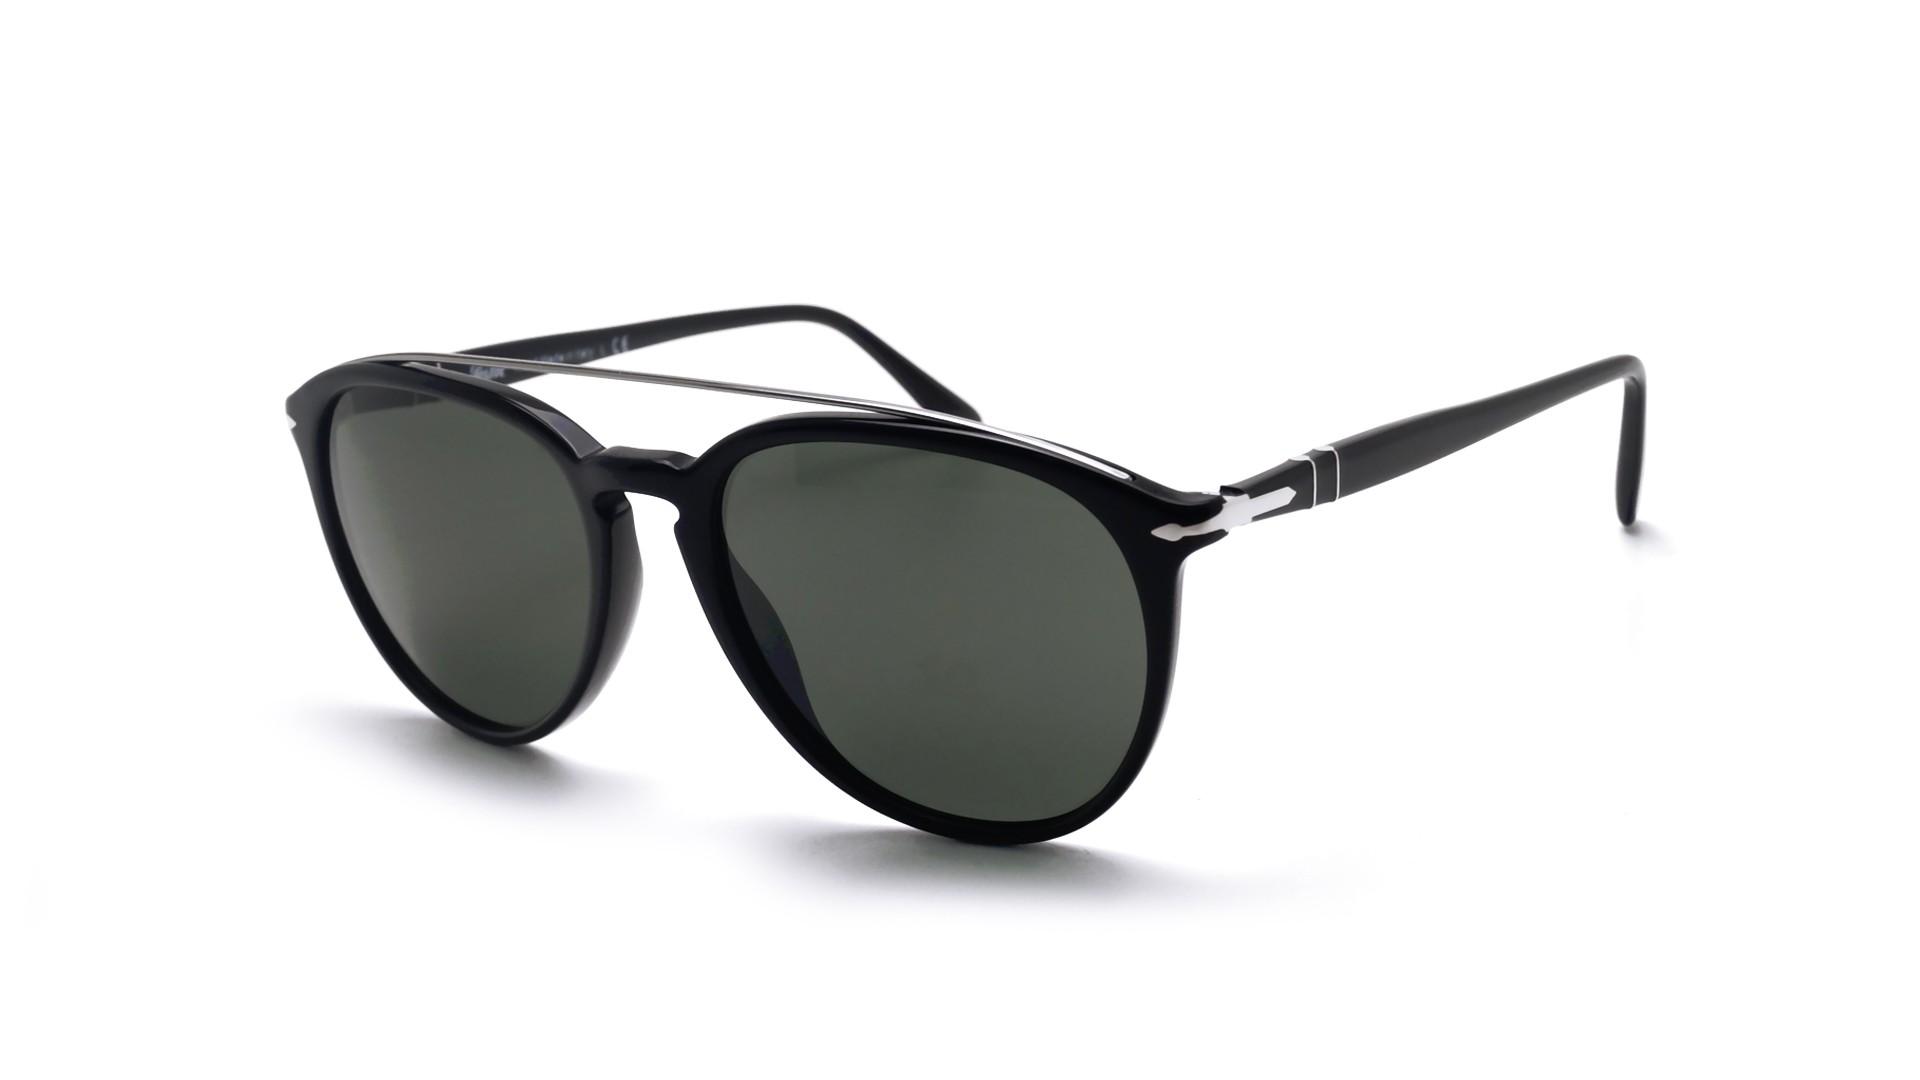 0eddec5659 Sunglasses Persol PO3159S 901431 55-19 Black Large